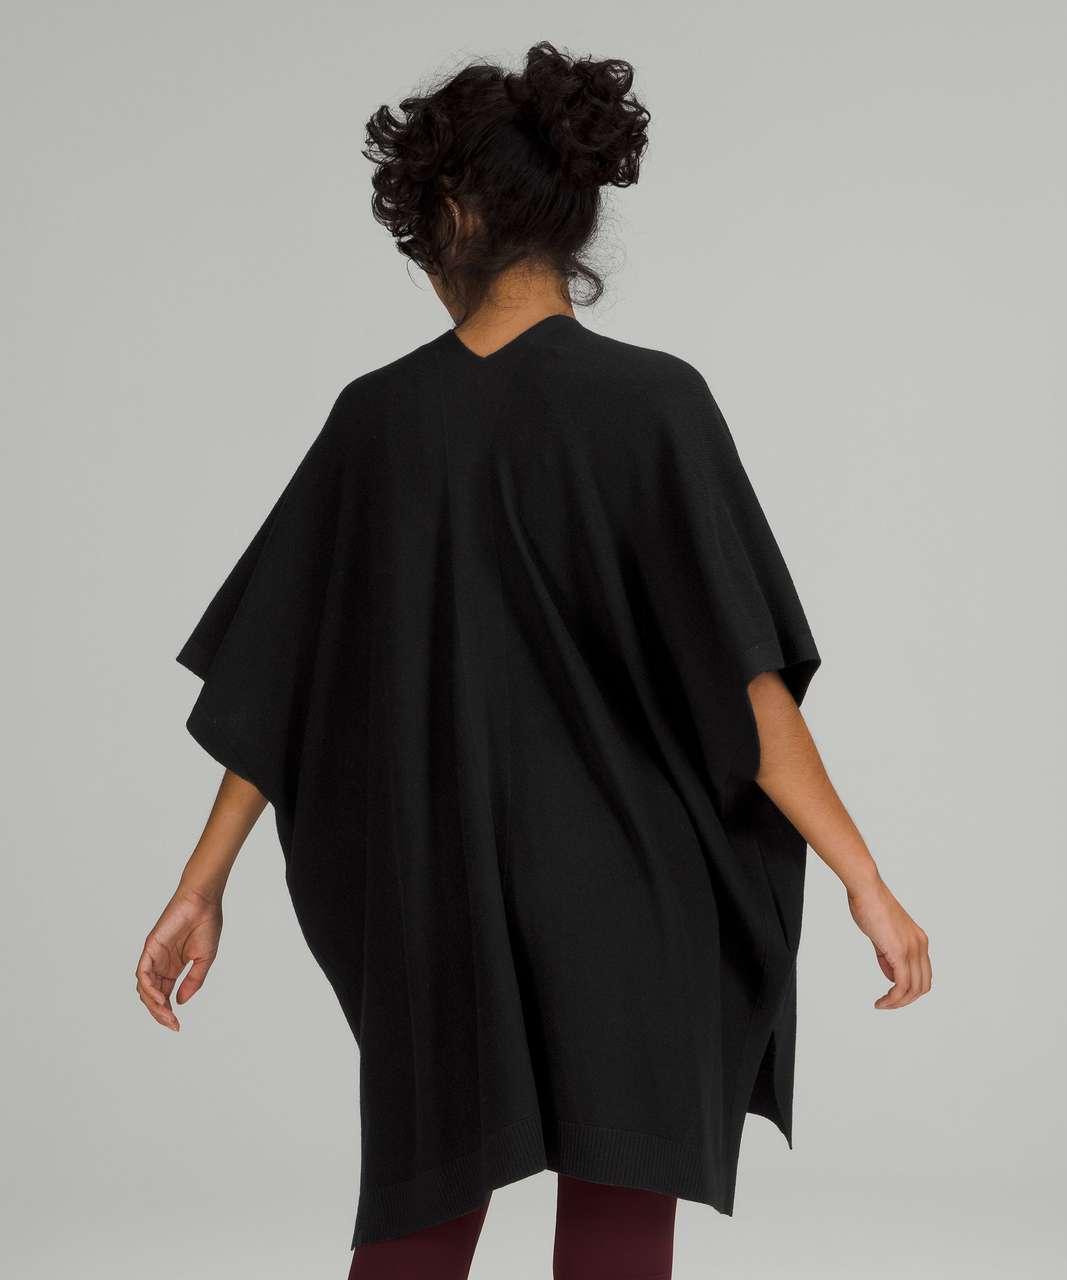 Lululemon Merino Wool Short Sleeve Wrap - Black